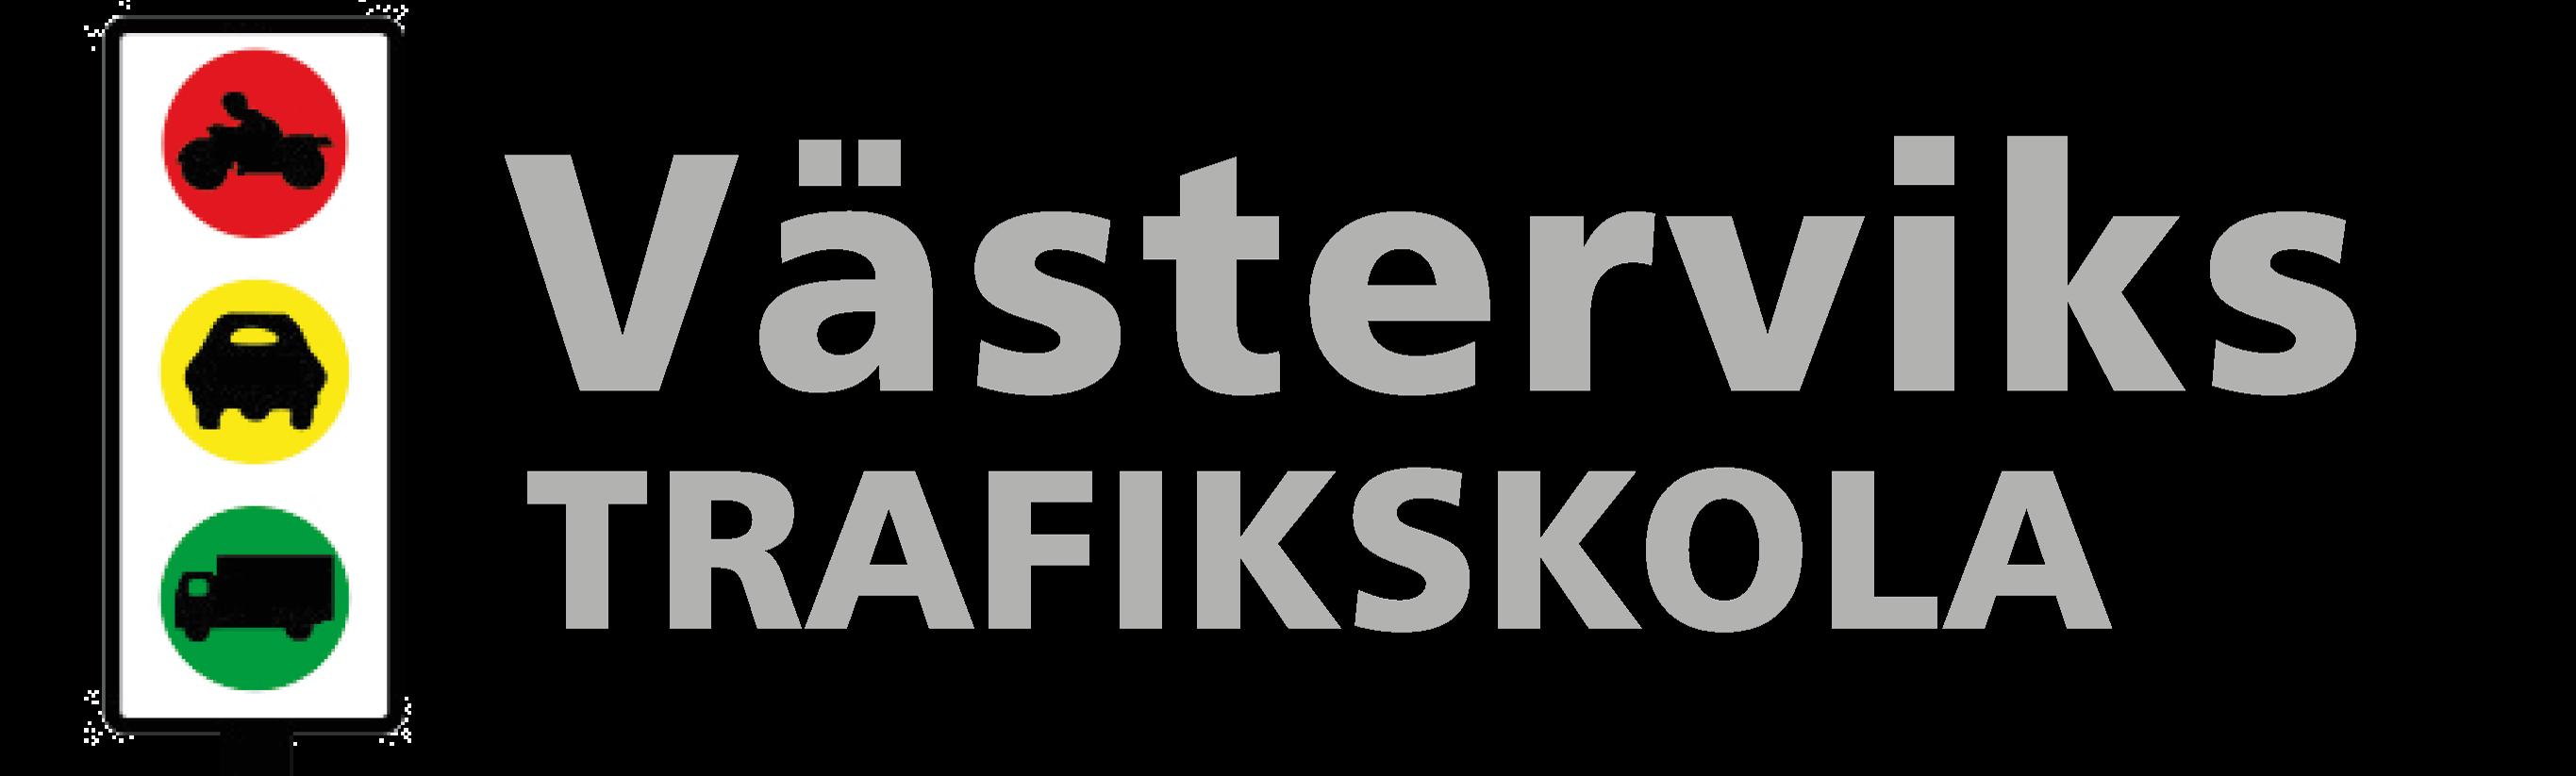 Vasterviks-trafikskola_ny-logga2